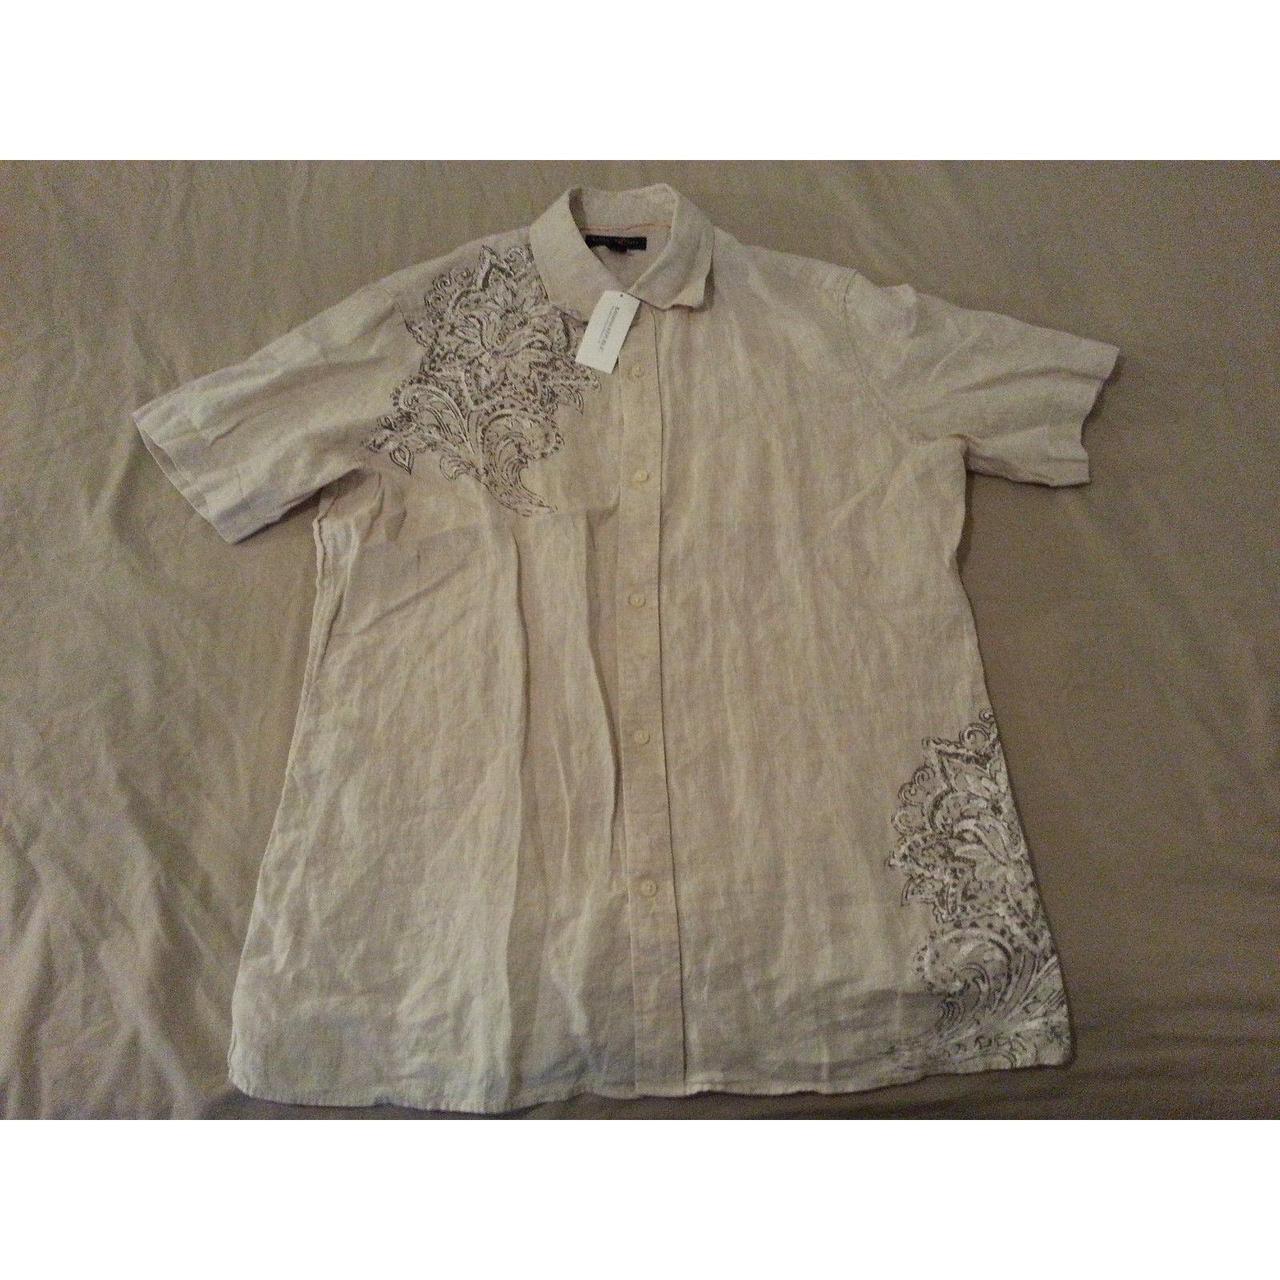 Product Image 1 - New Banana Republic Linen Dress